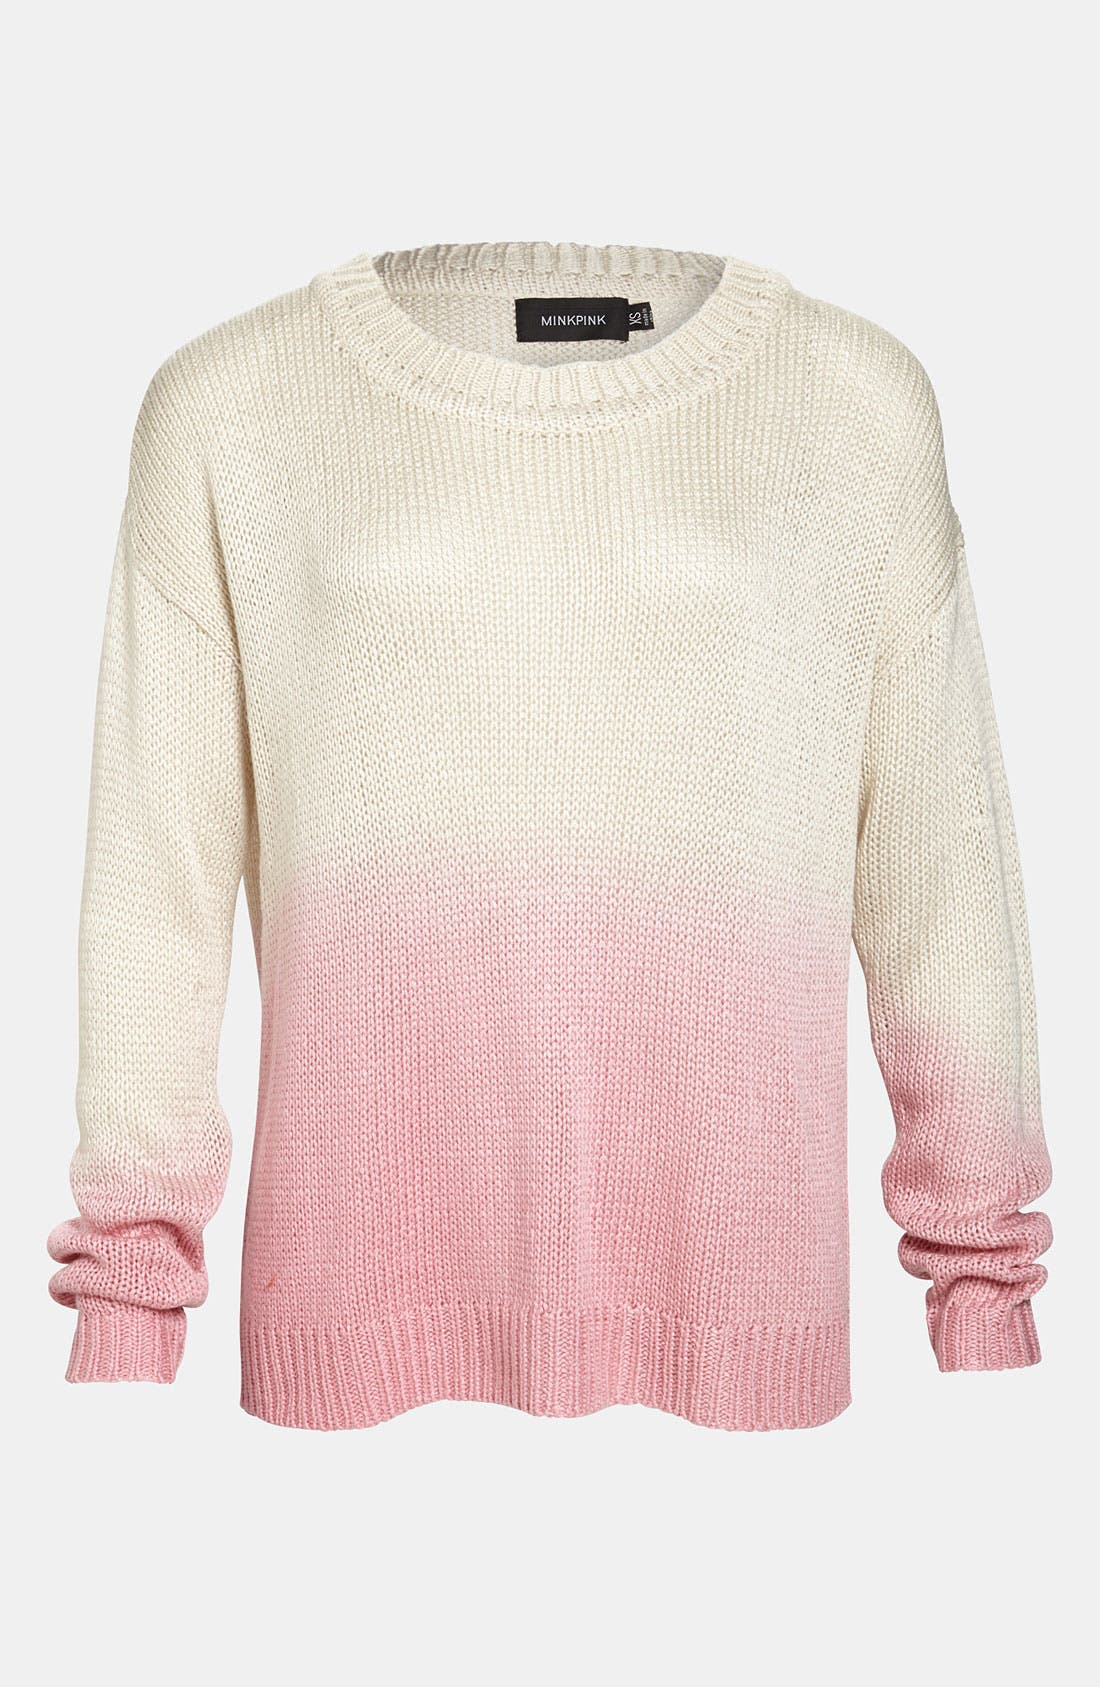 Main Image - MINKPINK 'Melting Moments' Dip Dye Sweater